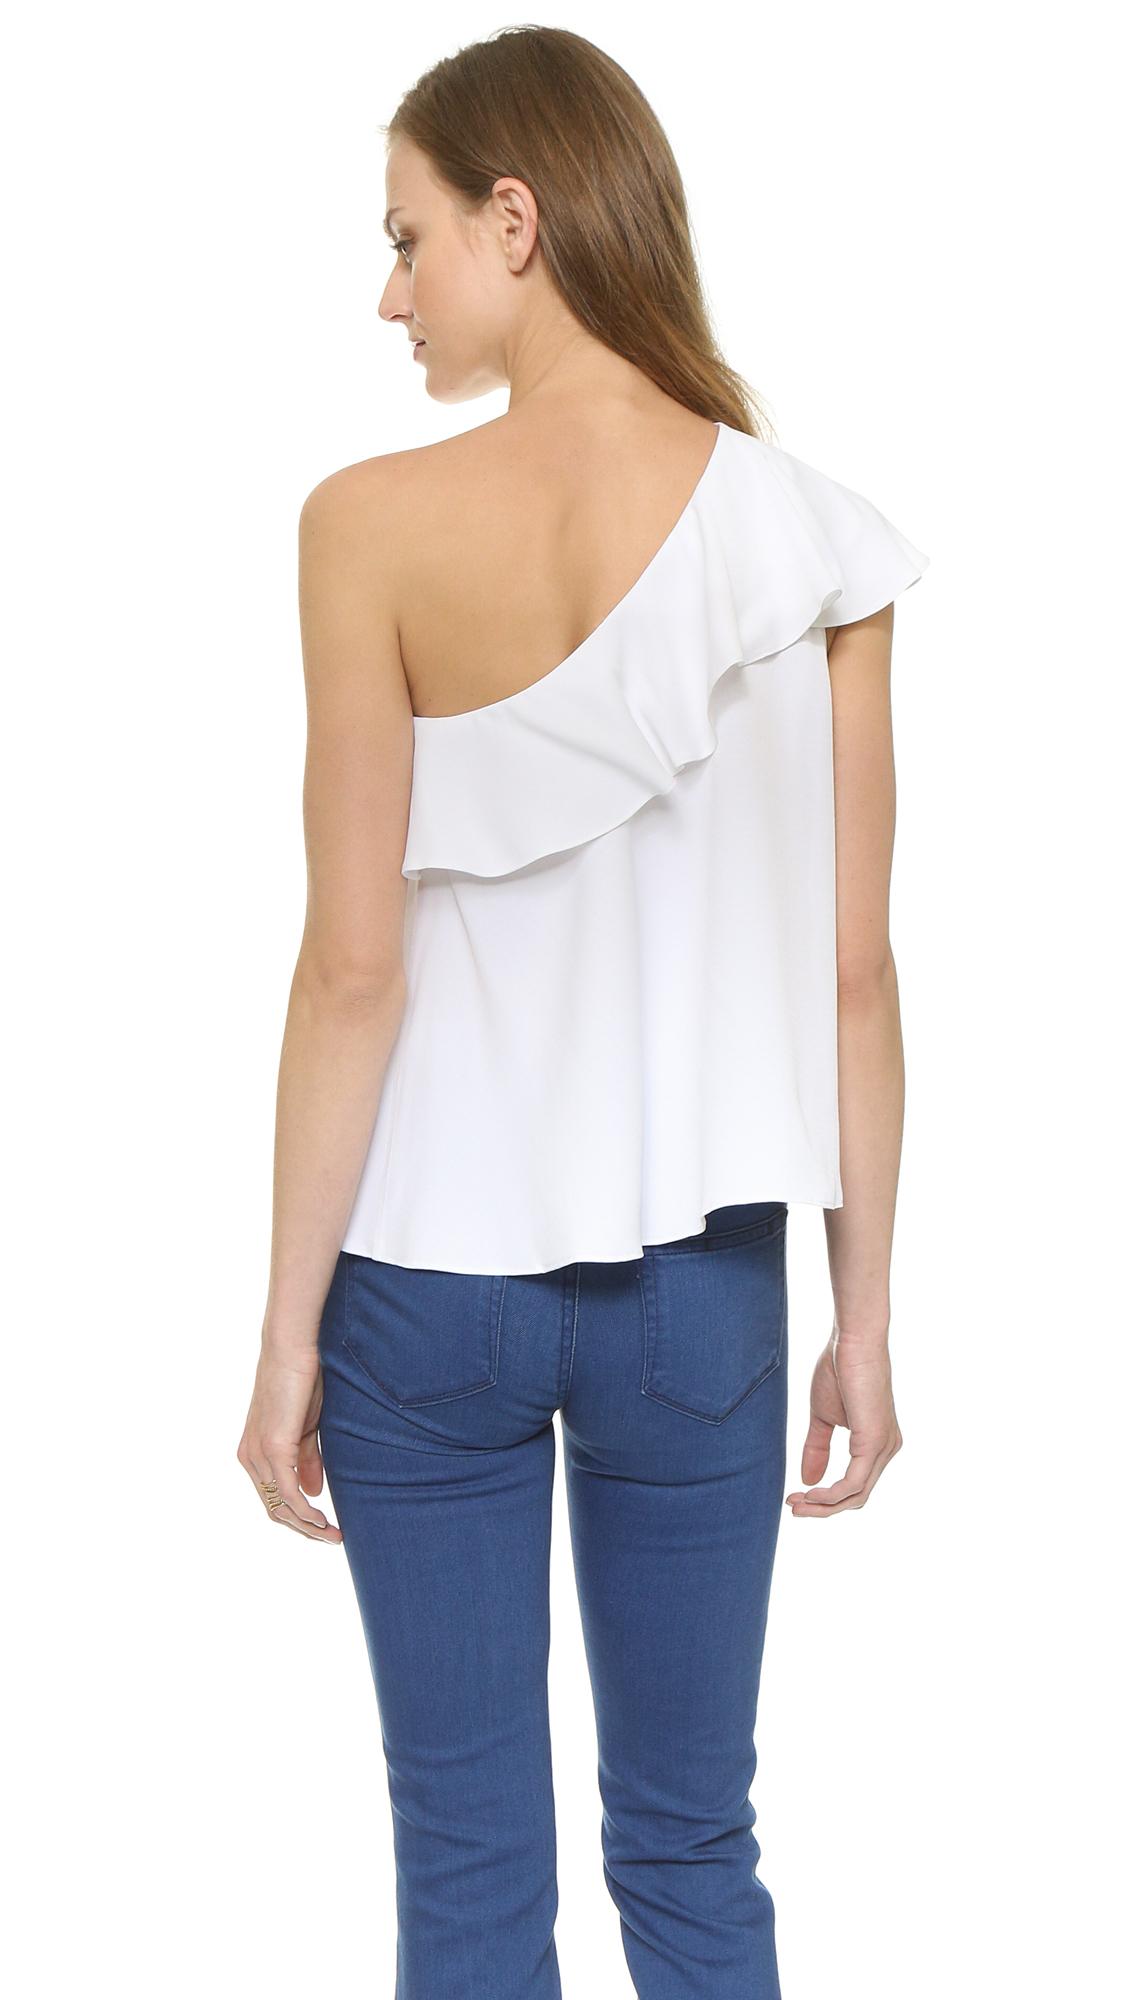 b7346cac13107b Rachel Zoe Leena One Shoulder Ruffle Top - Peche in White - Lyst